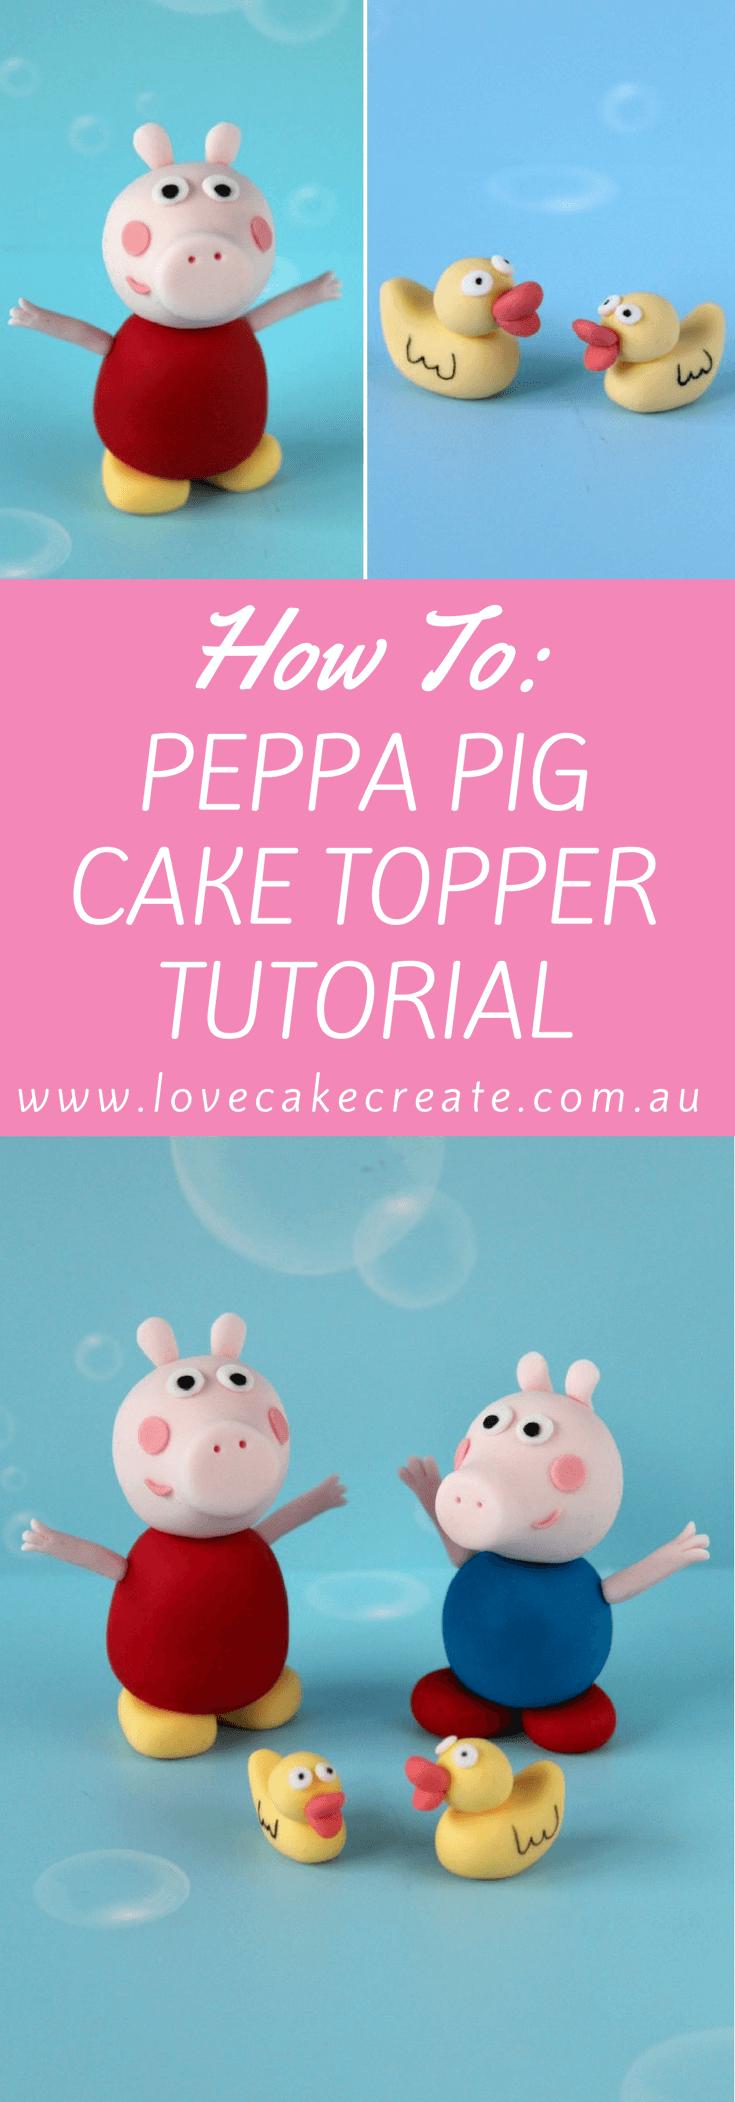 Peppa Pig Cake Topper Tutorial - by Love Cake Create